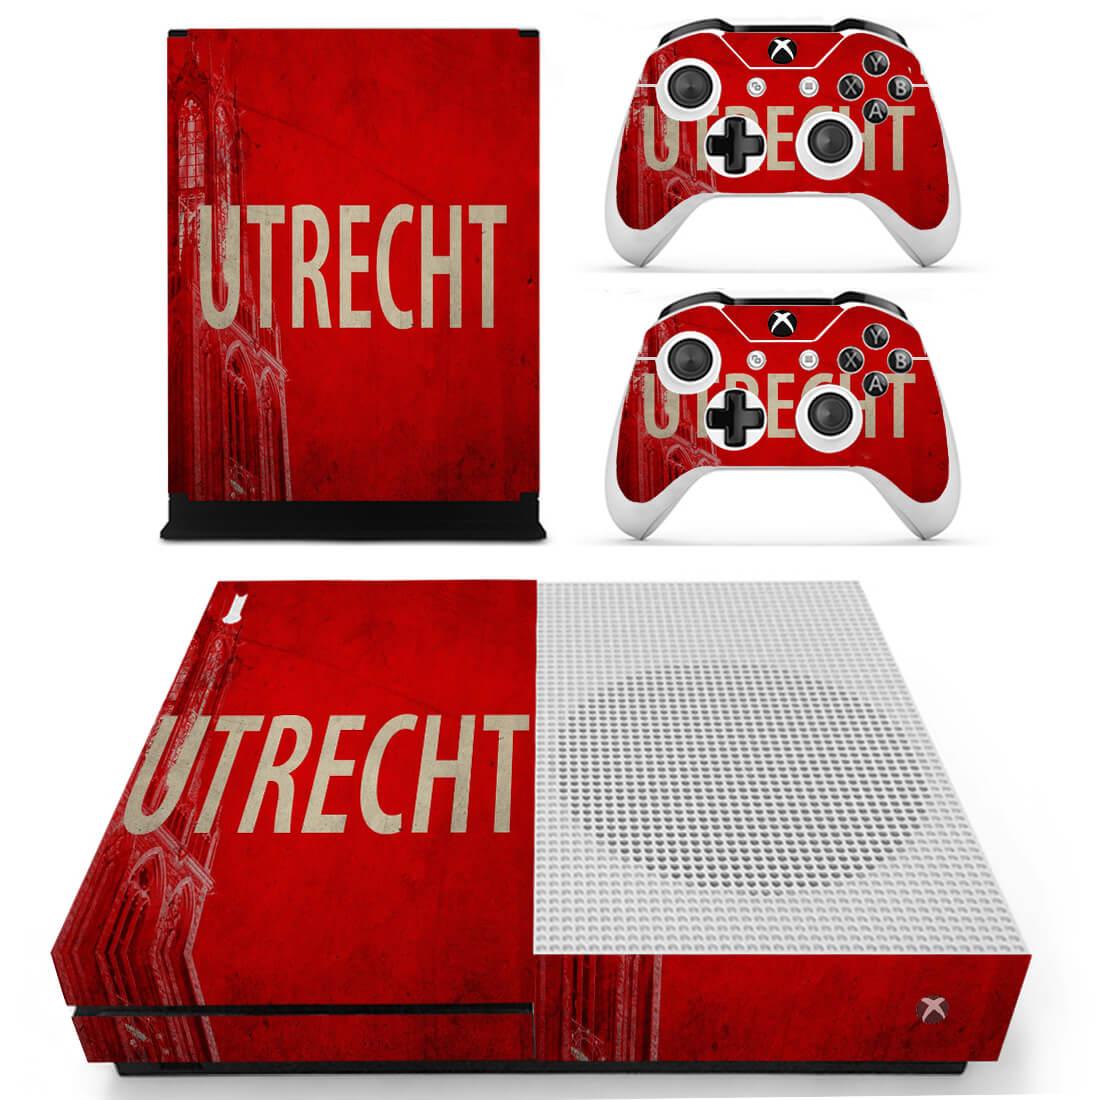 Utrecht Xbox One S skin